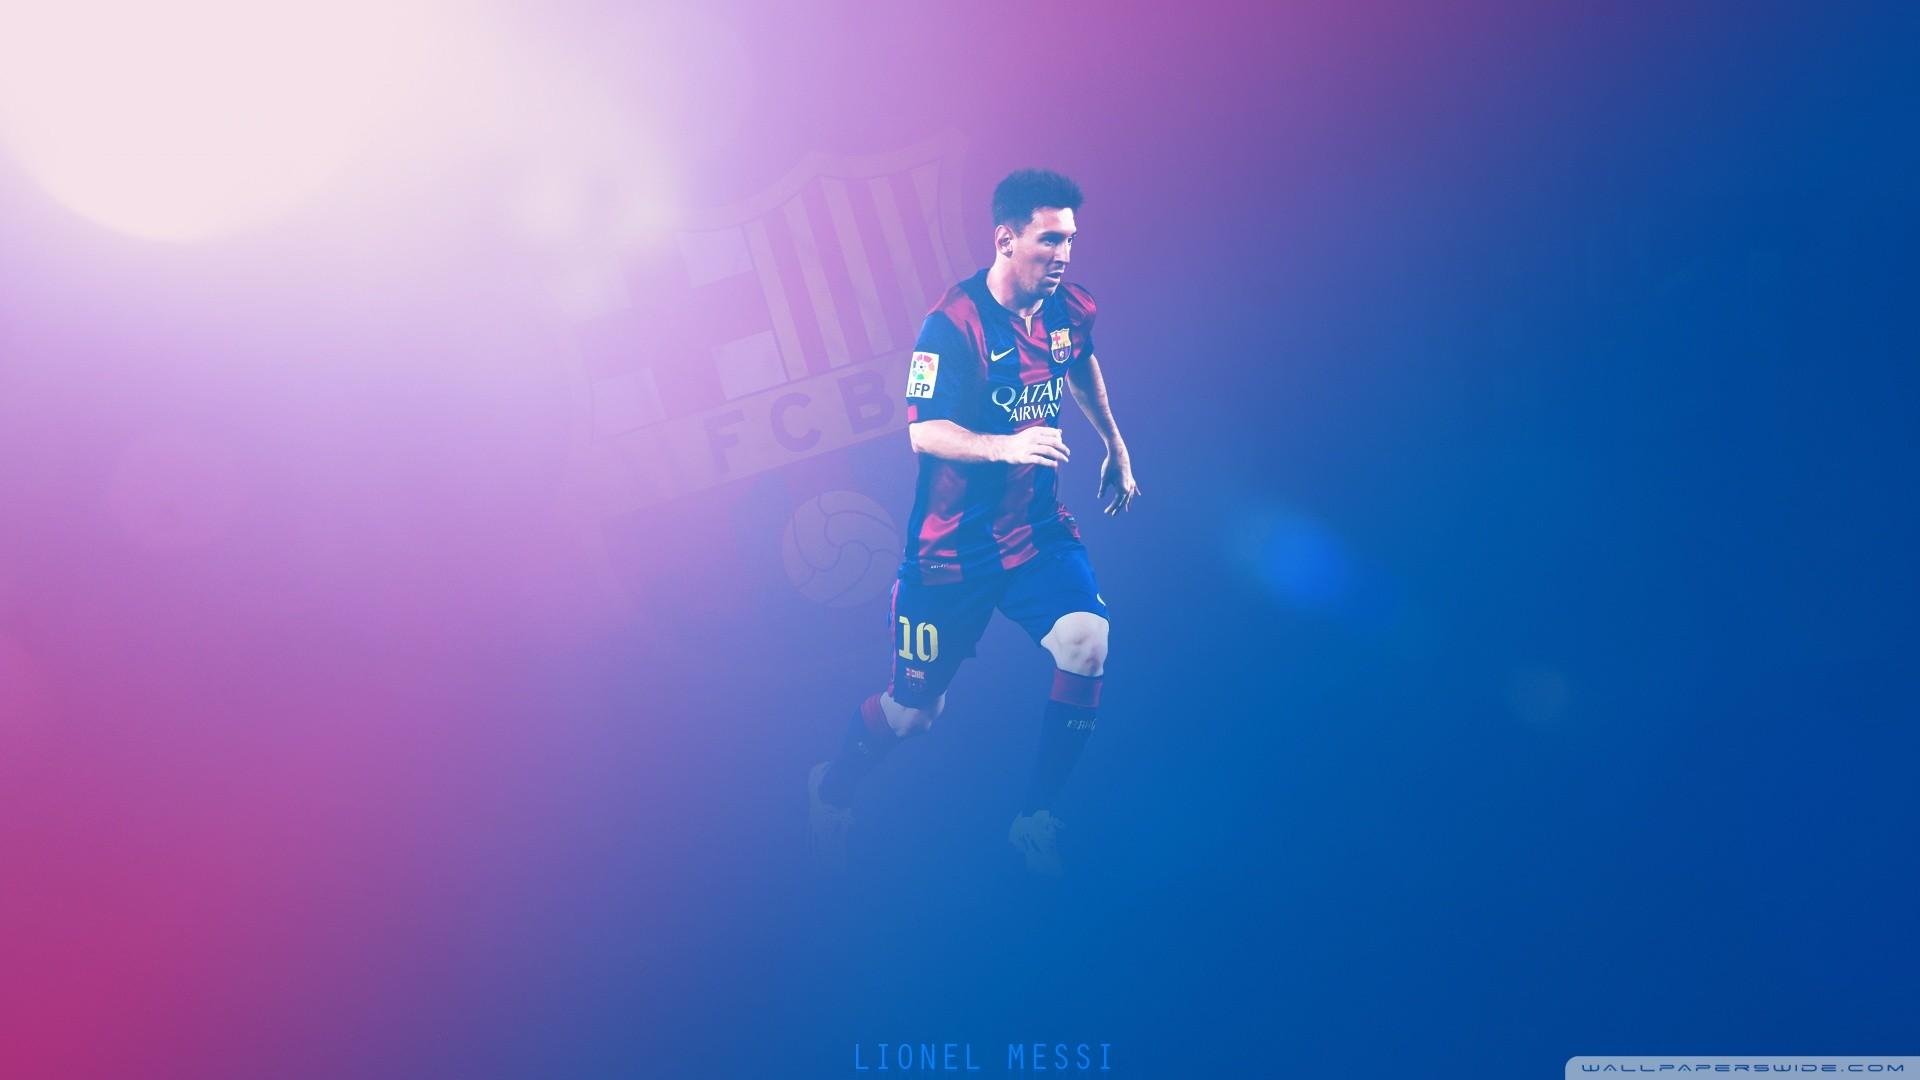 Lionel Messi – Barcelona HD Wide Wallpaper for Widescreen